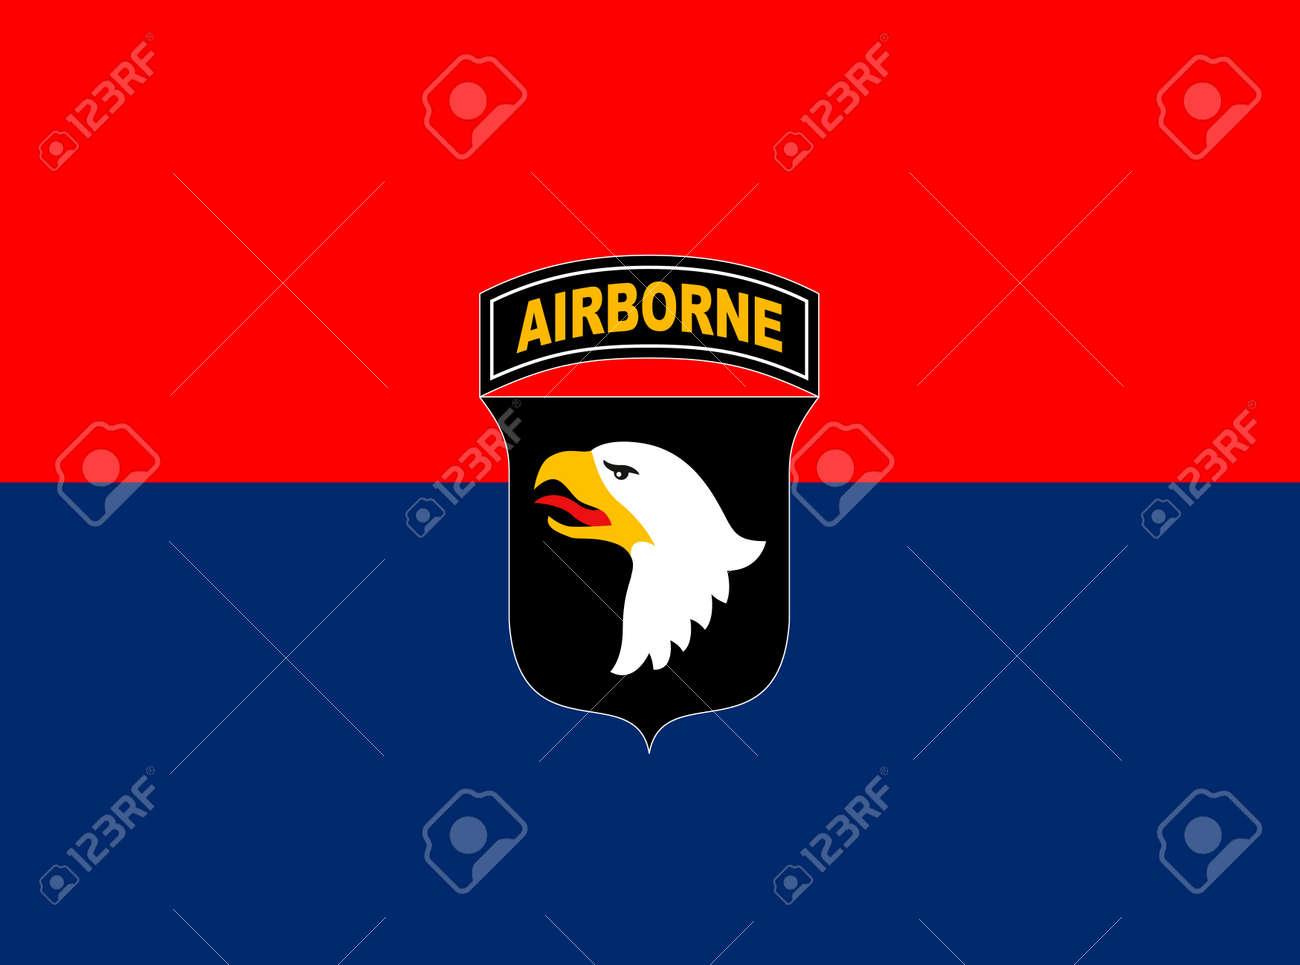 US 101st Airborne Division flag, United States of America, vector illustration - 172710992